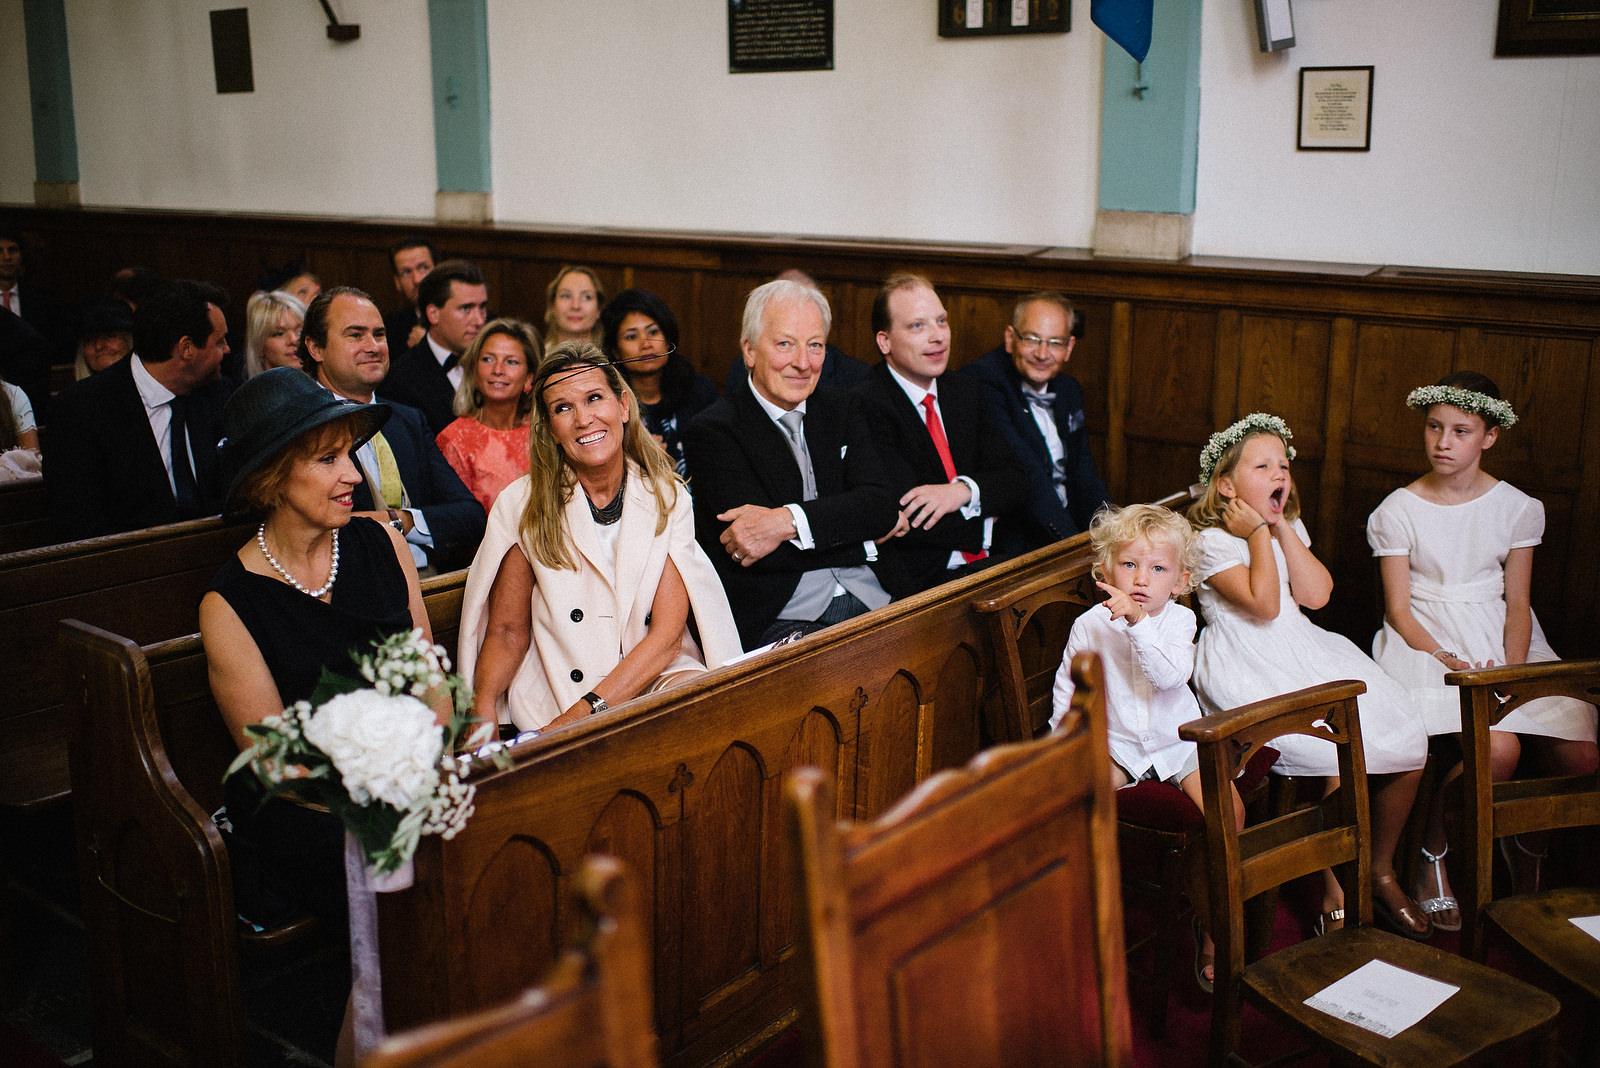 Fotograf Konstanz - Destination Wedding Photographer Amsterdam 039 - Destination Wedding Amsterdam  - 149 -